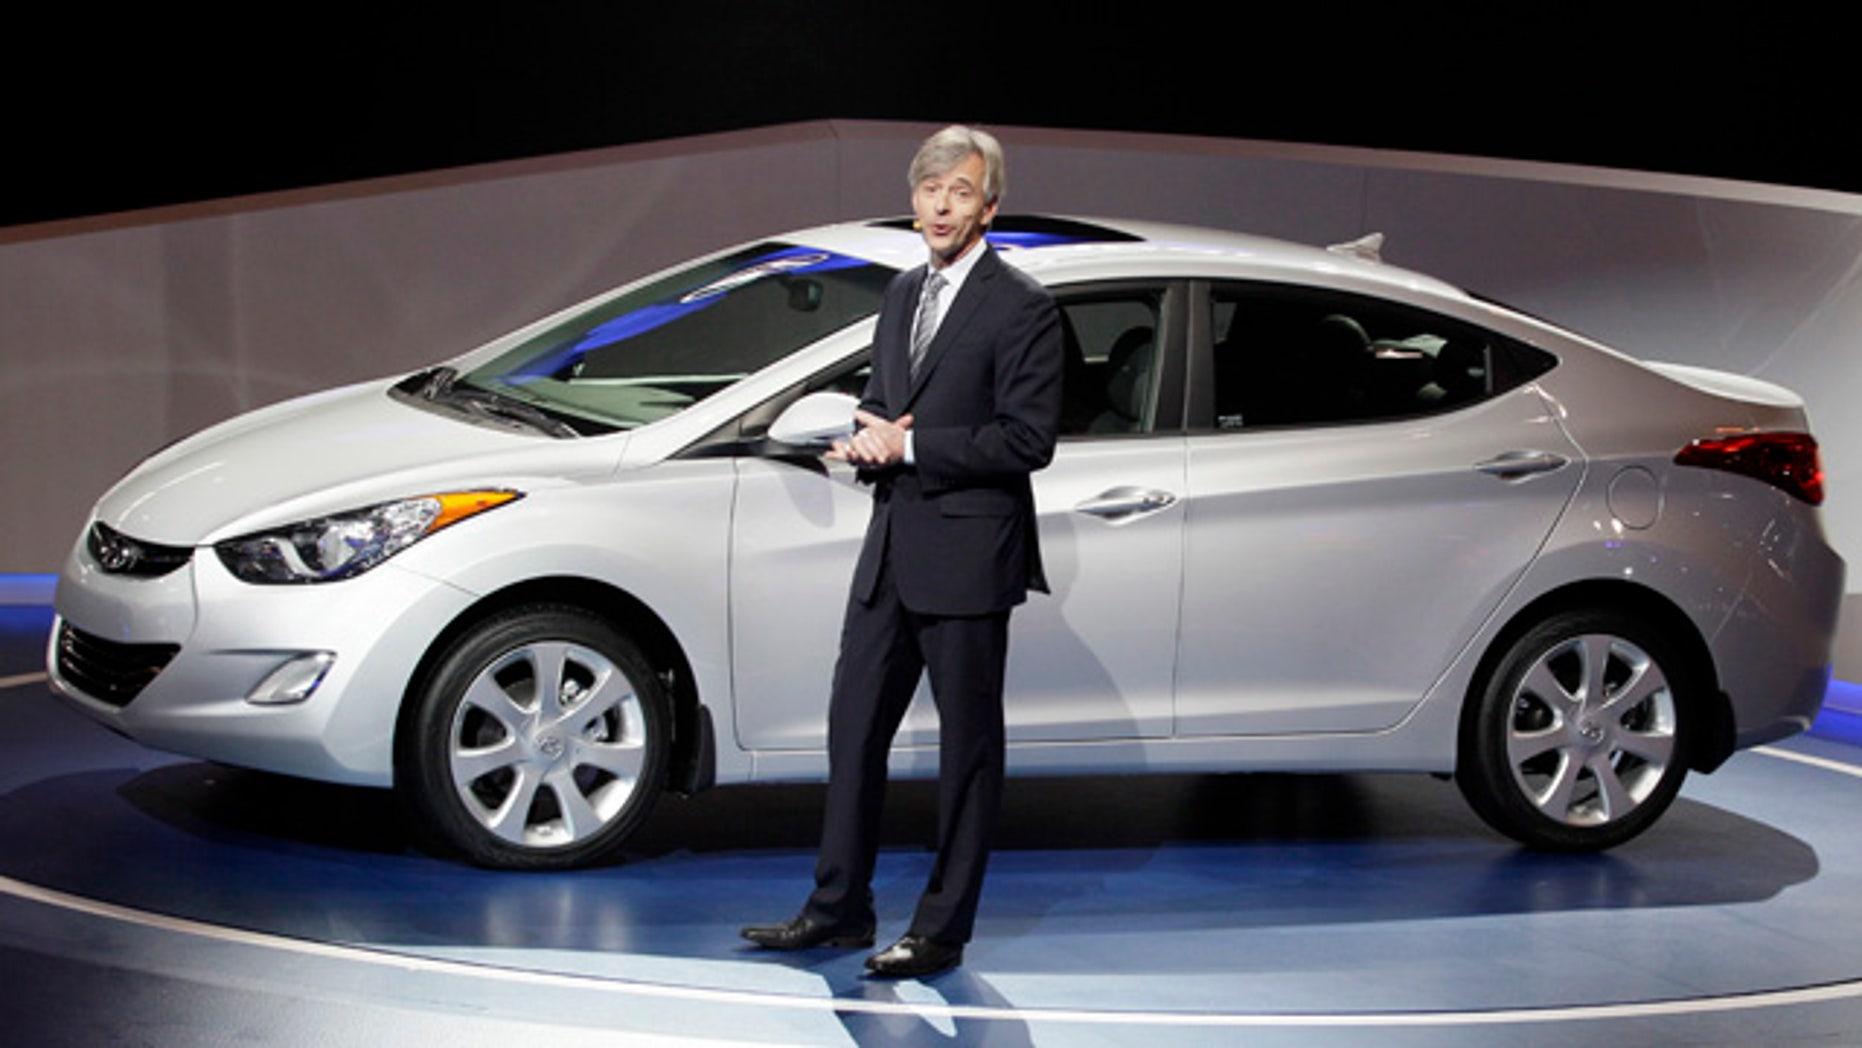 Hyundai CEO says 'no' to trucks, 'yes' to large cars | Fox News